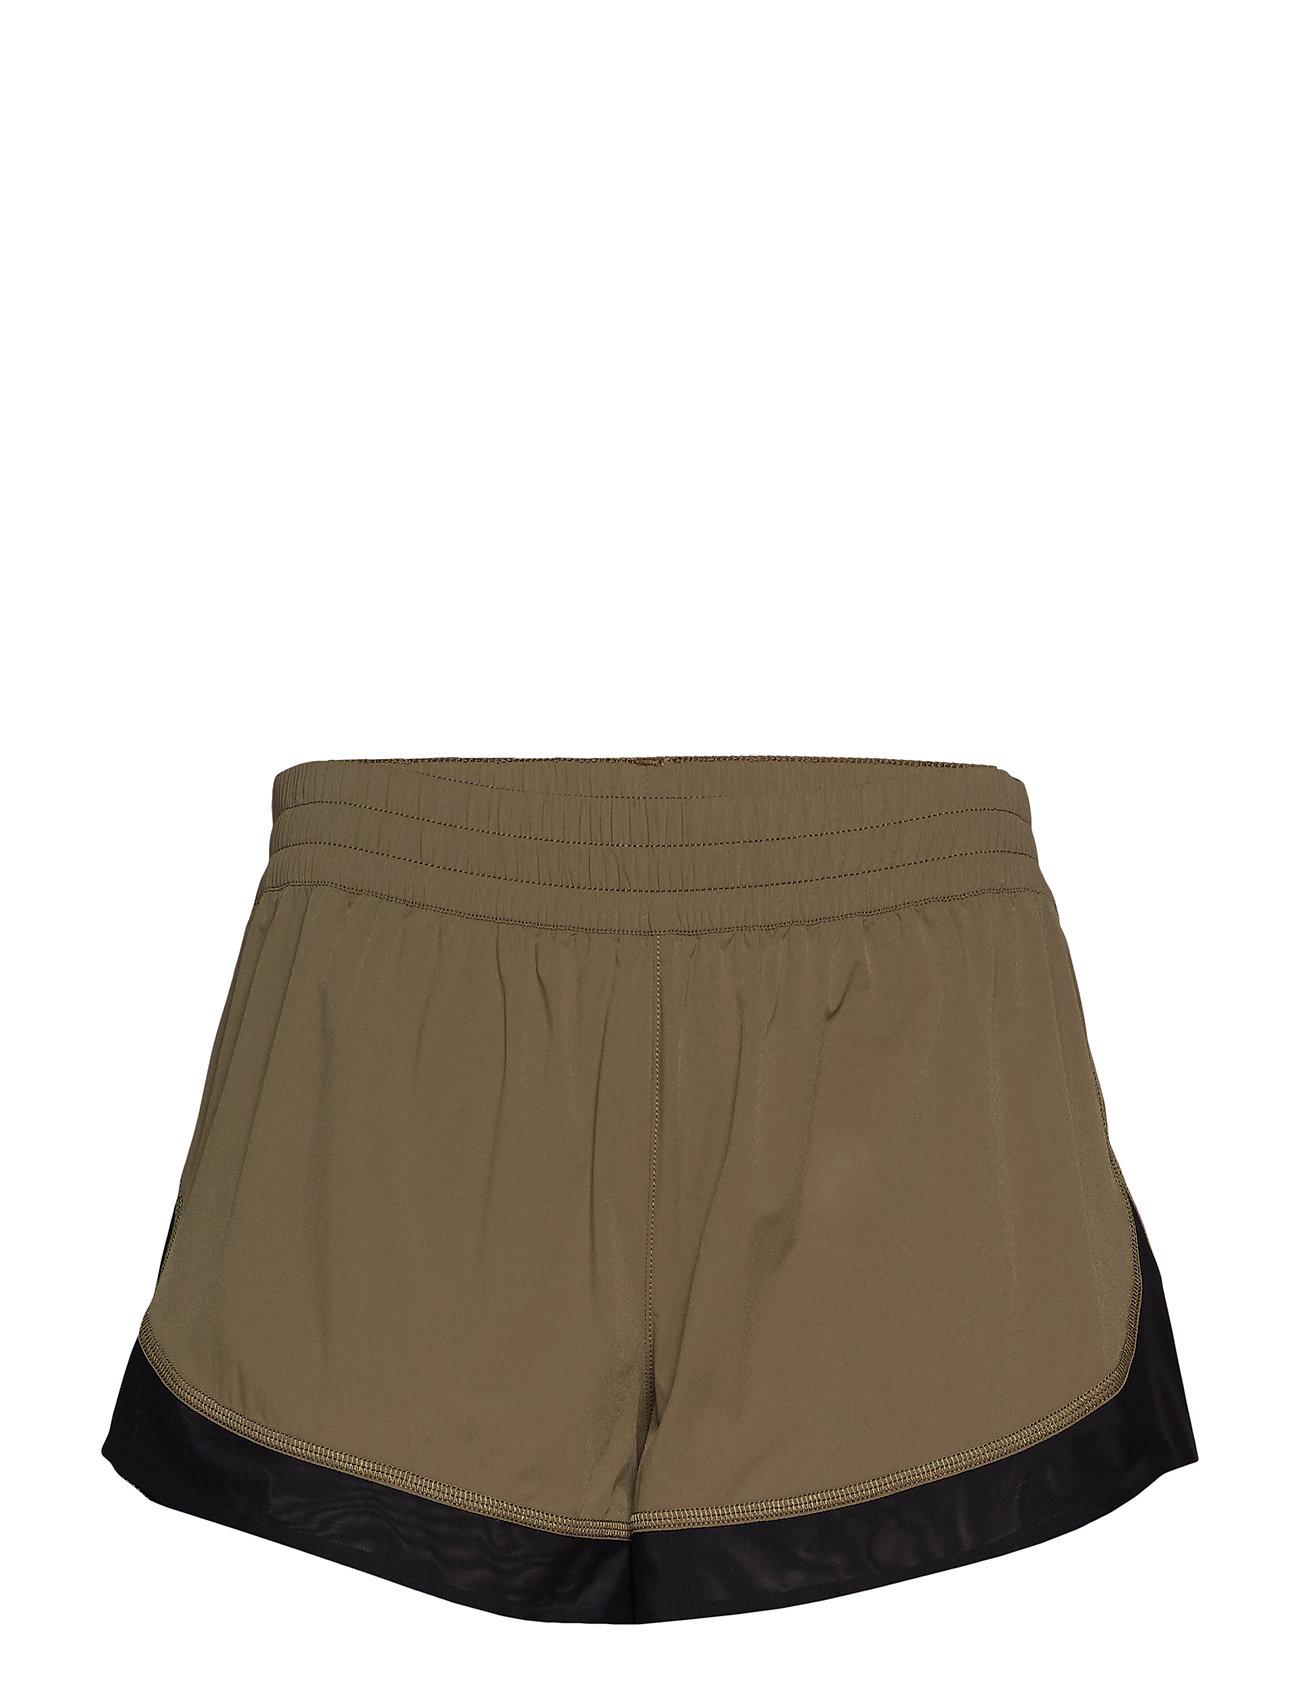 Seafolly Active Boardshort Shorts